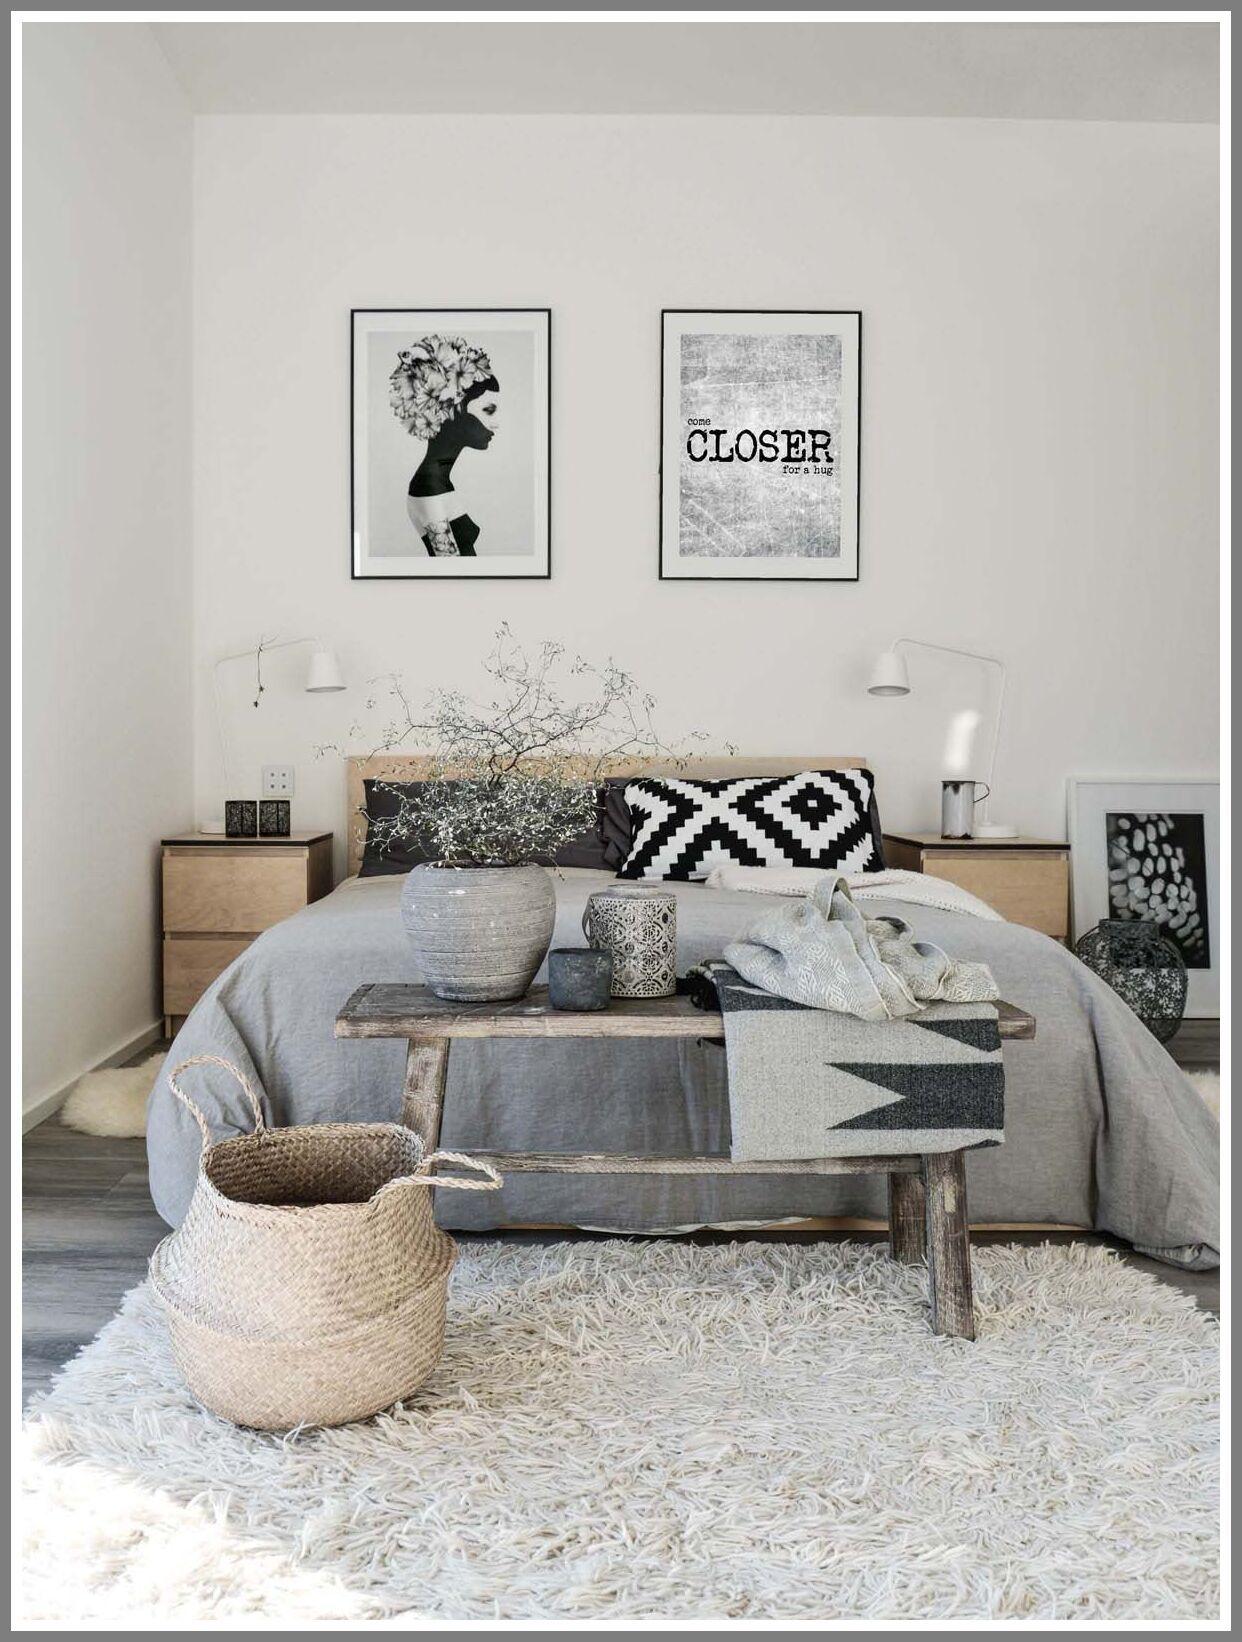 94 Reference Of Master Bedroom Scandinavian Interior Design In 2020 Scandinavian Interior Bedroom Bedroom Design Trends Minimalist Bedroom Design